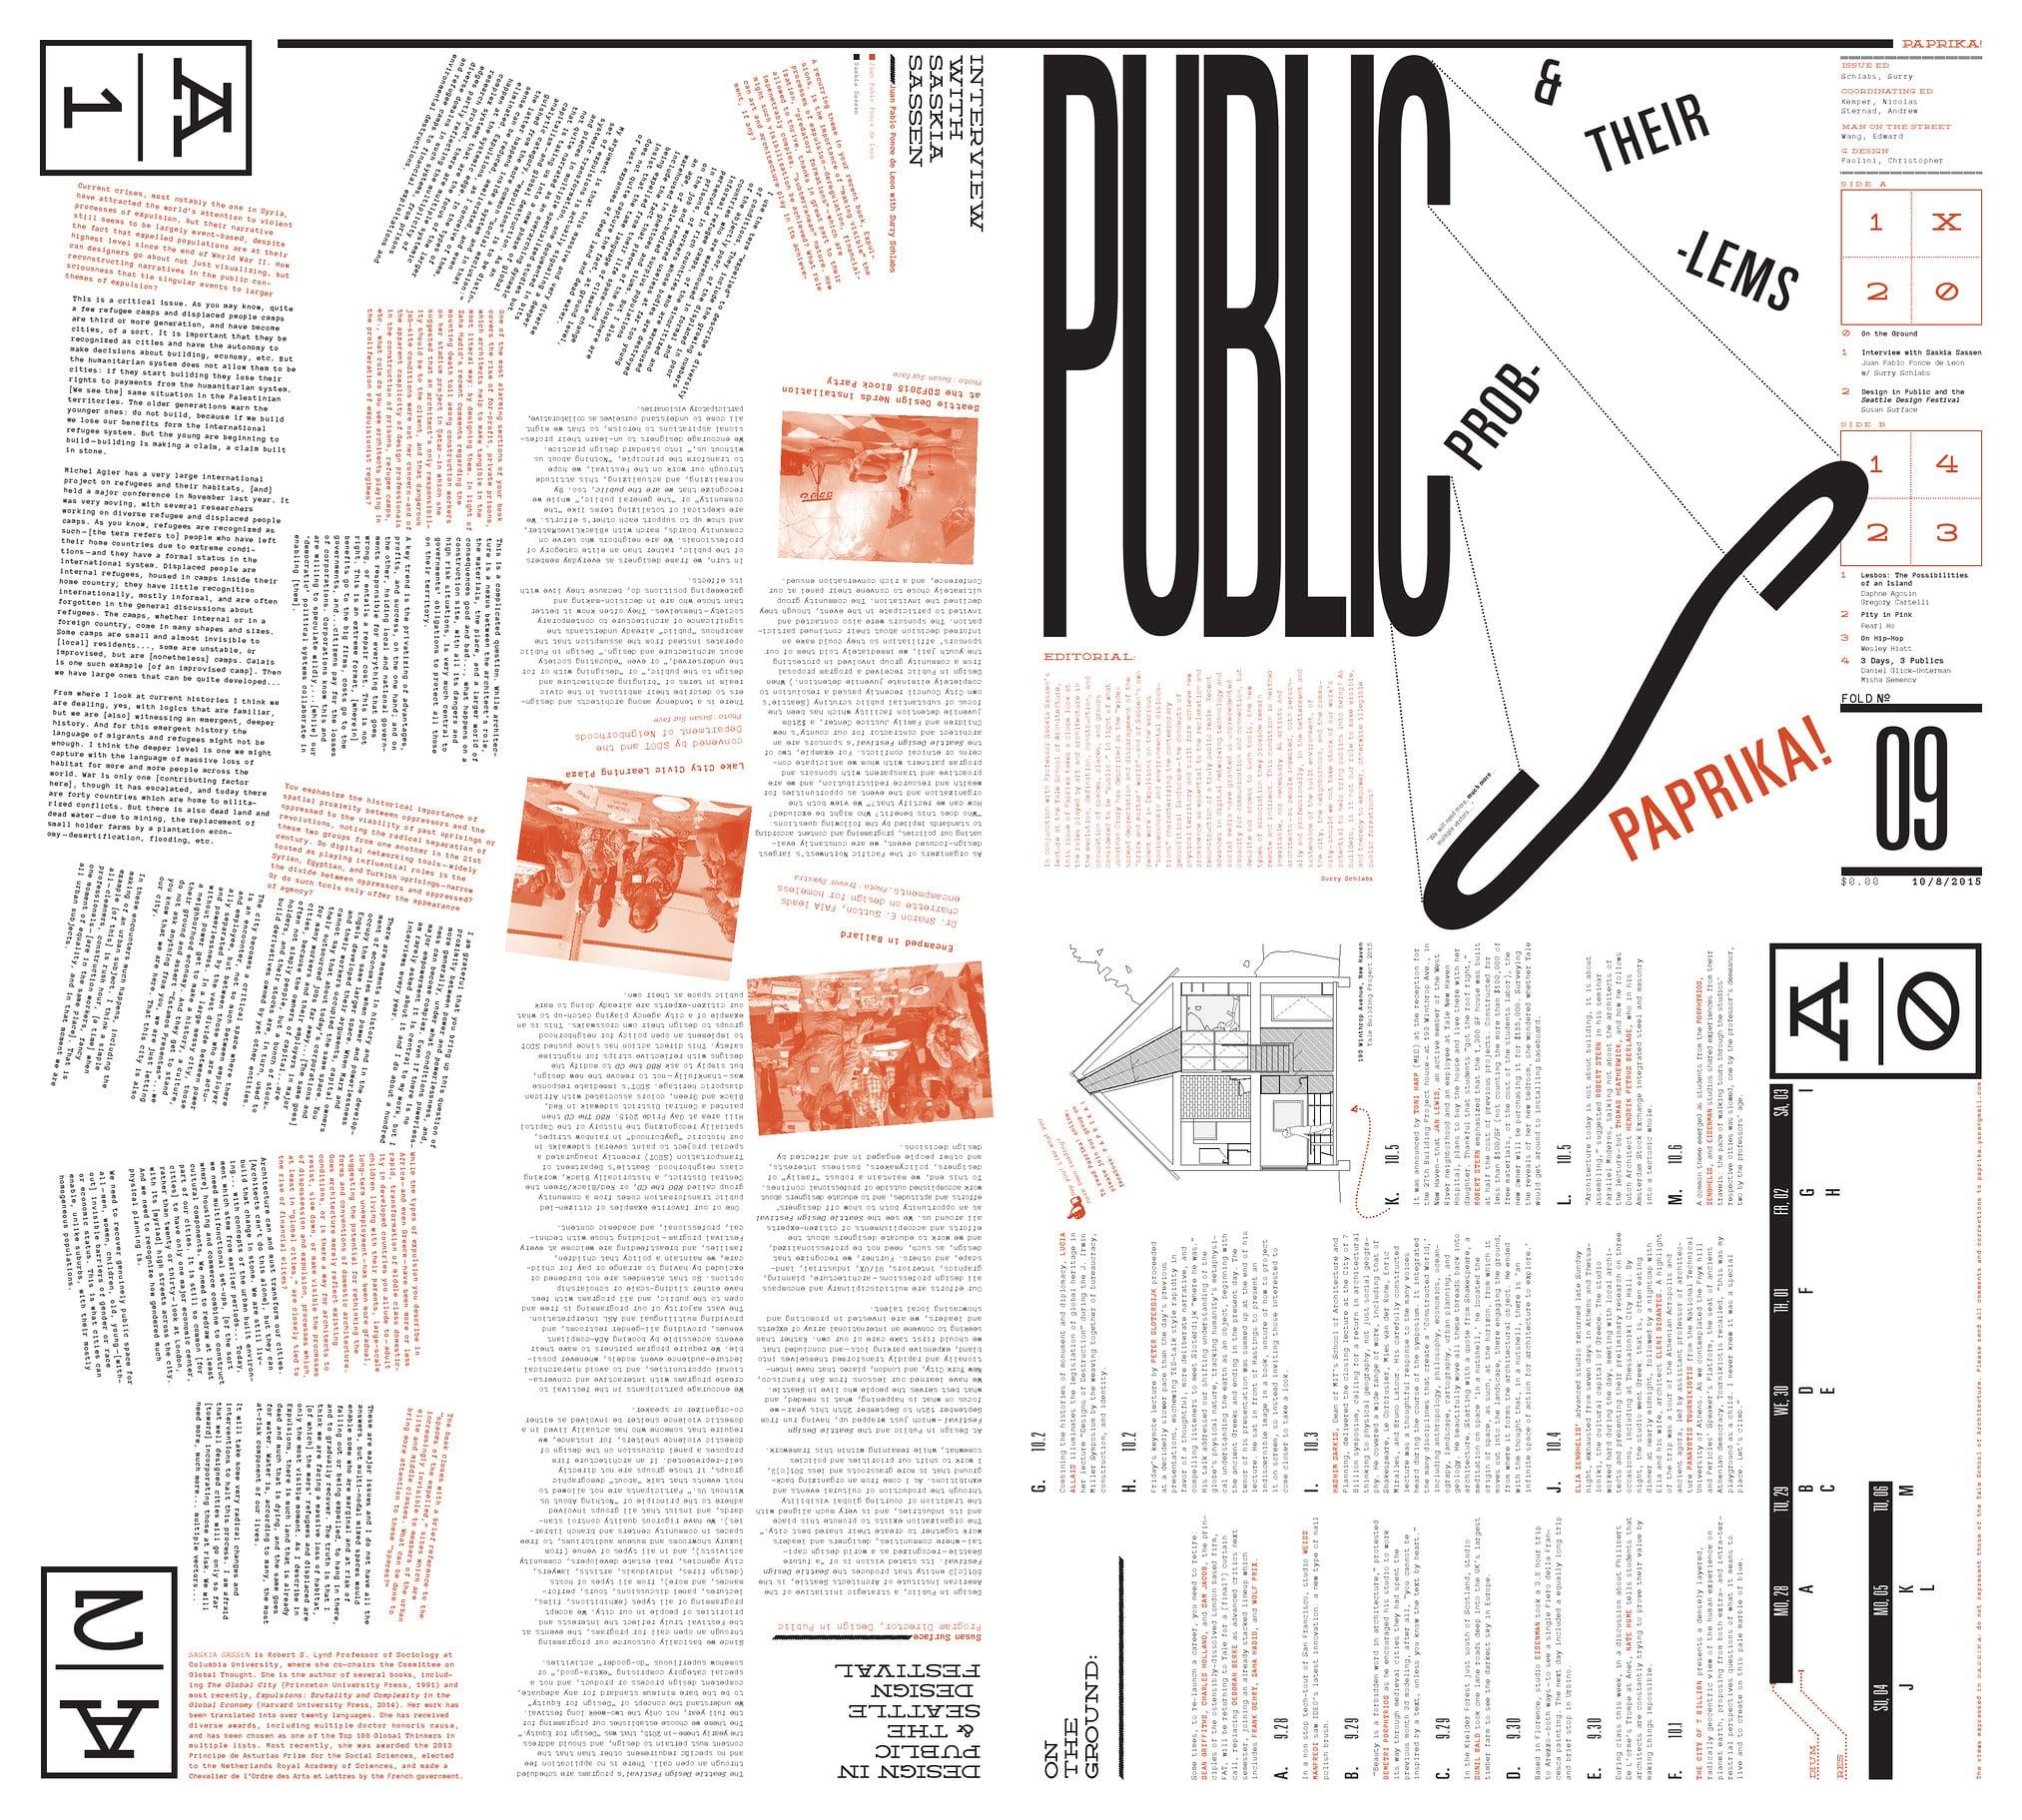 1-09 Publics & Their Problems